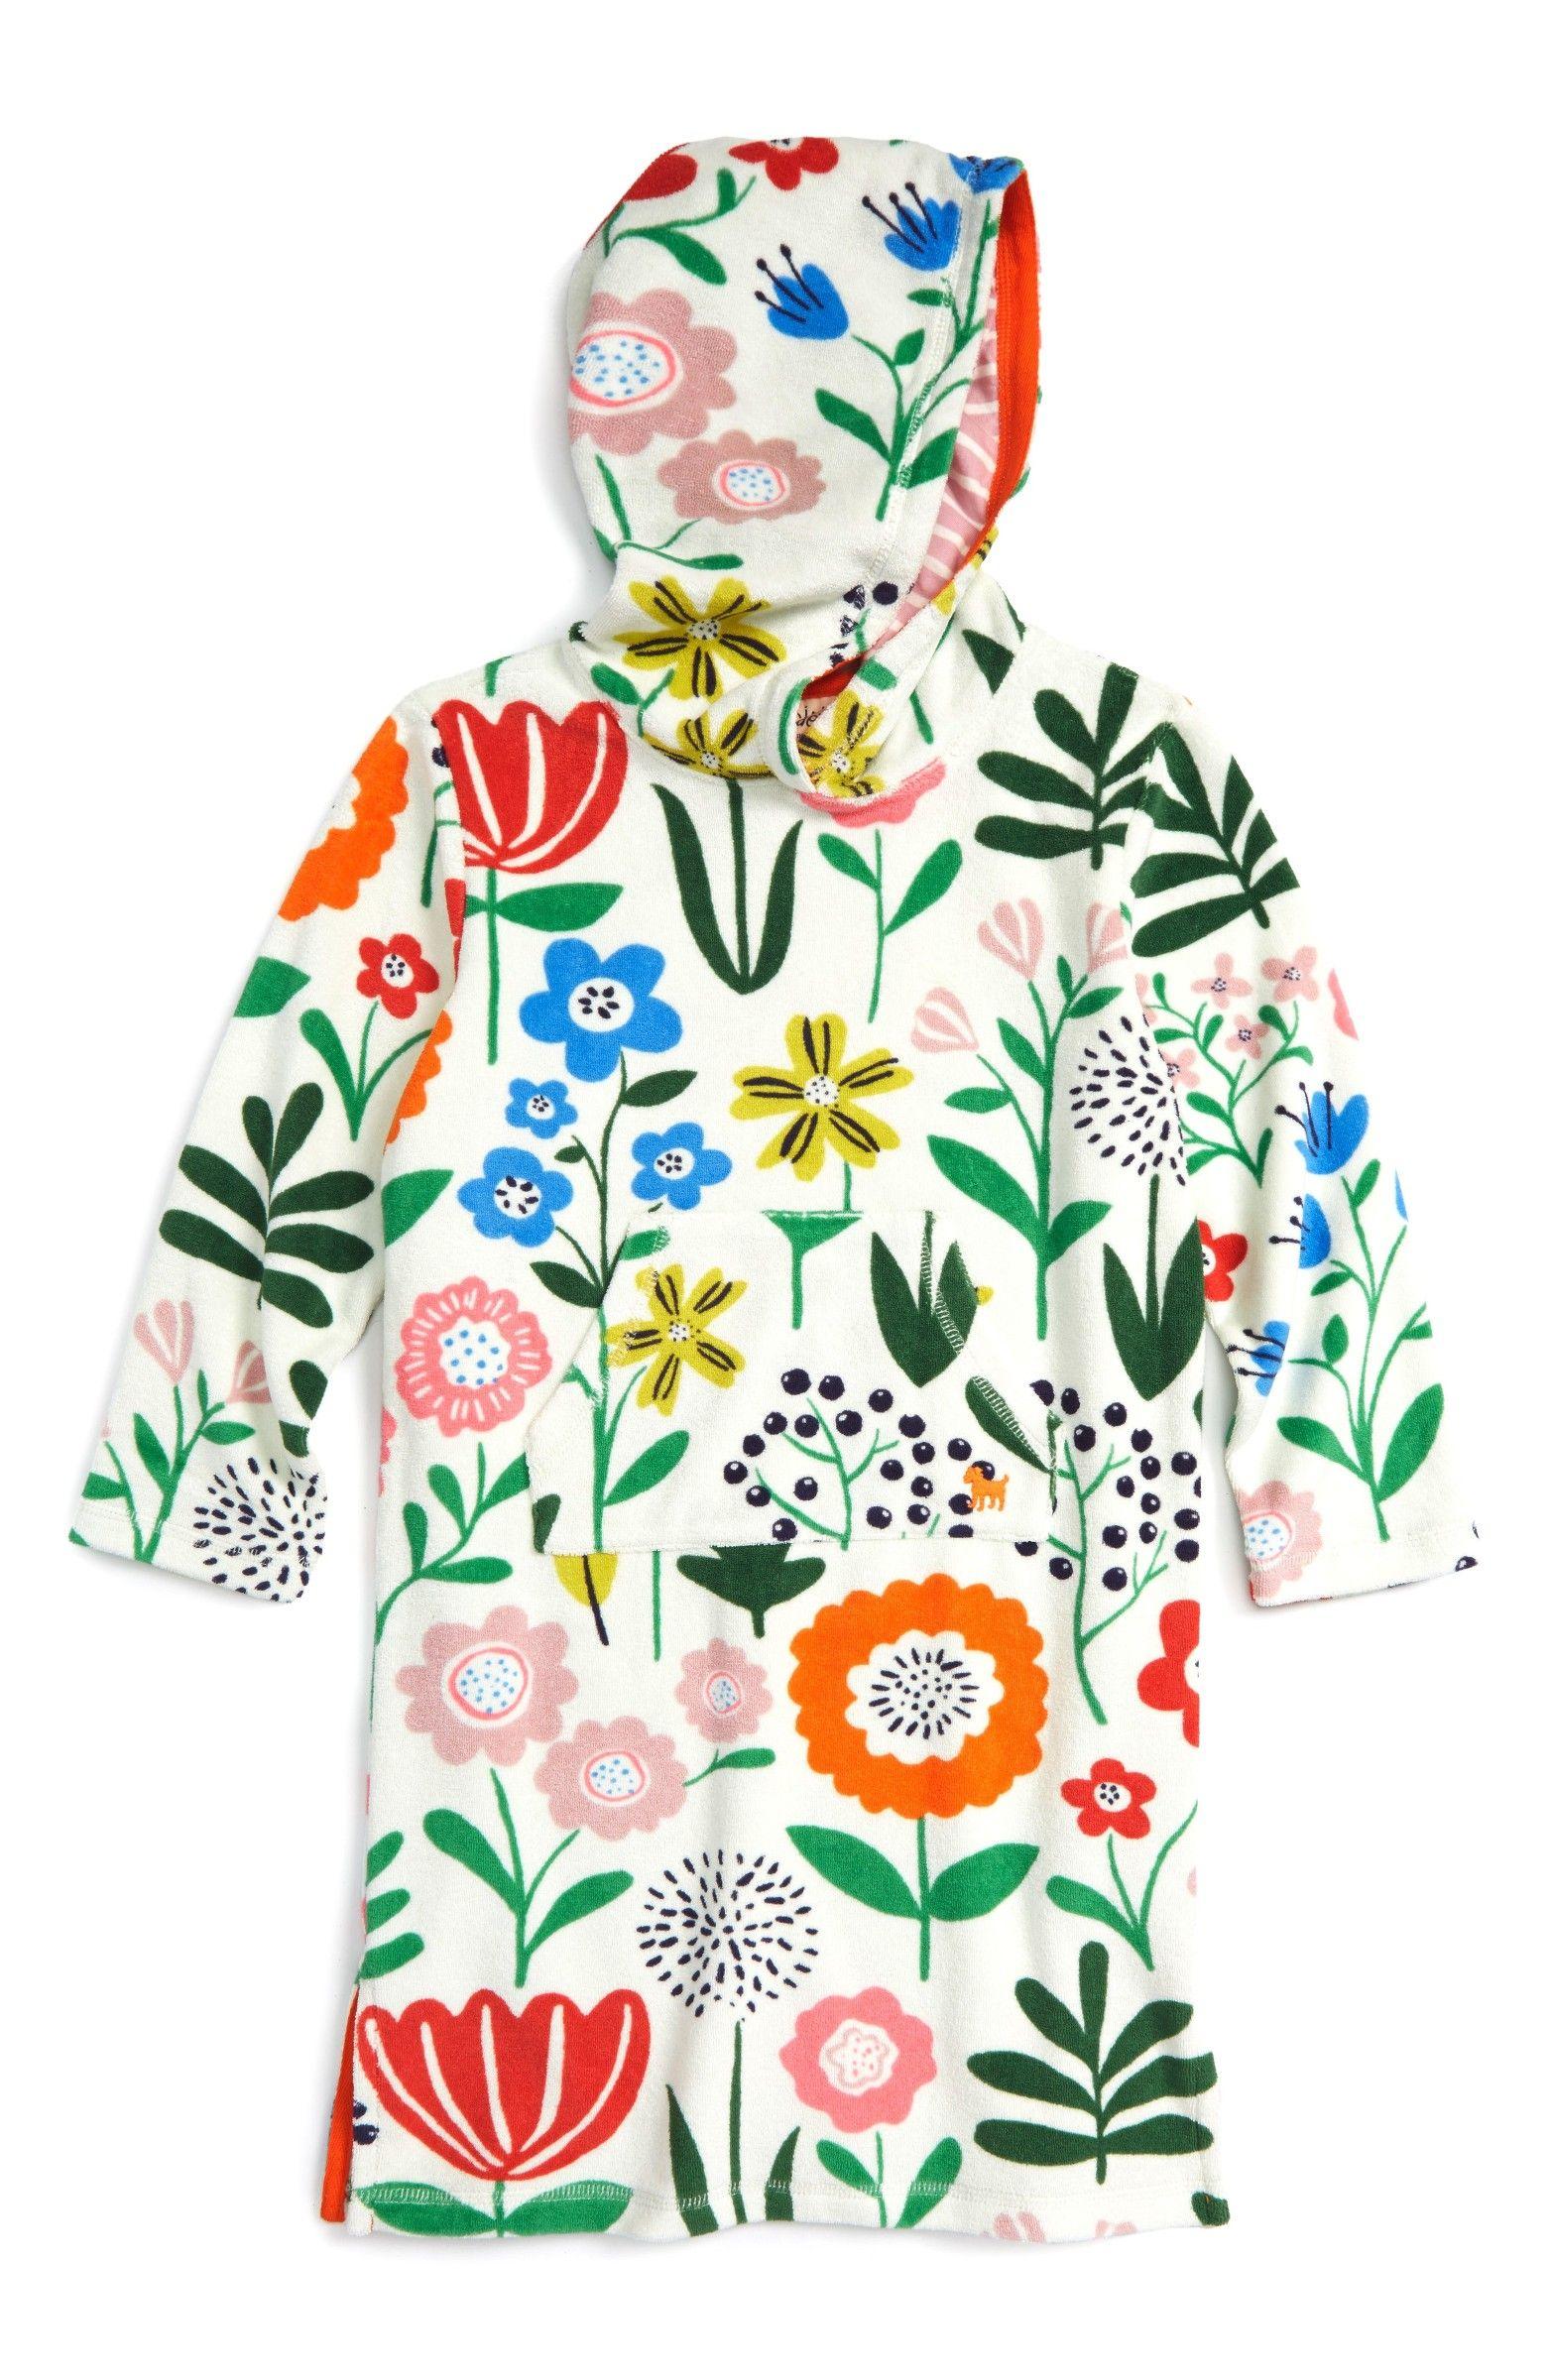 674c852b053 Main Image - Mini Boden Print Towelling Beach Dress (Toddler Girls ...